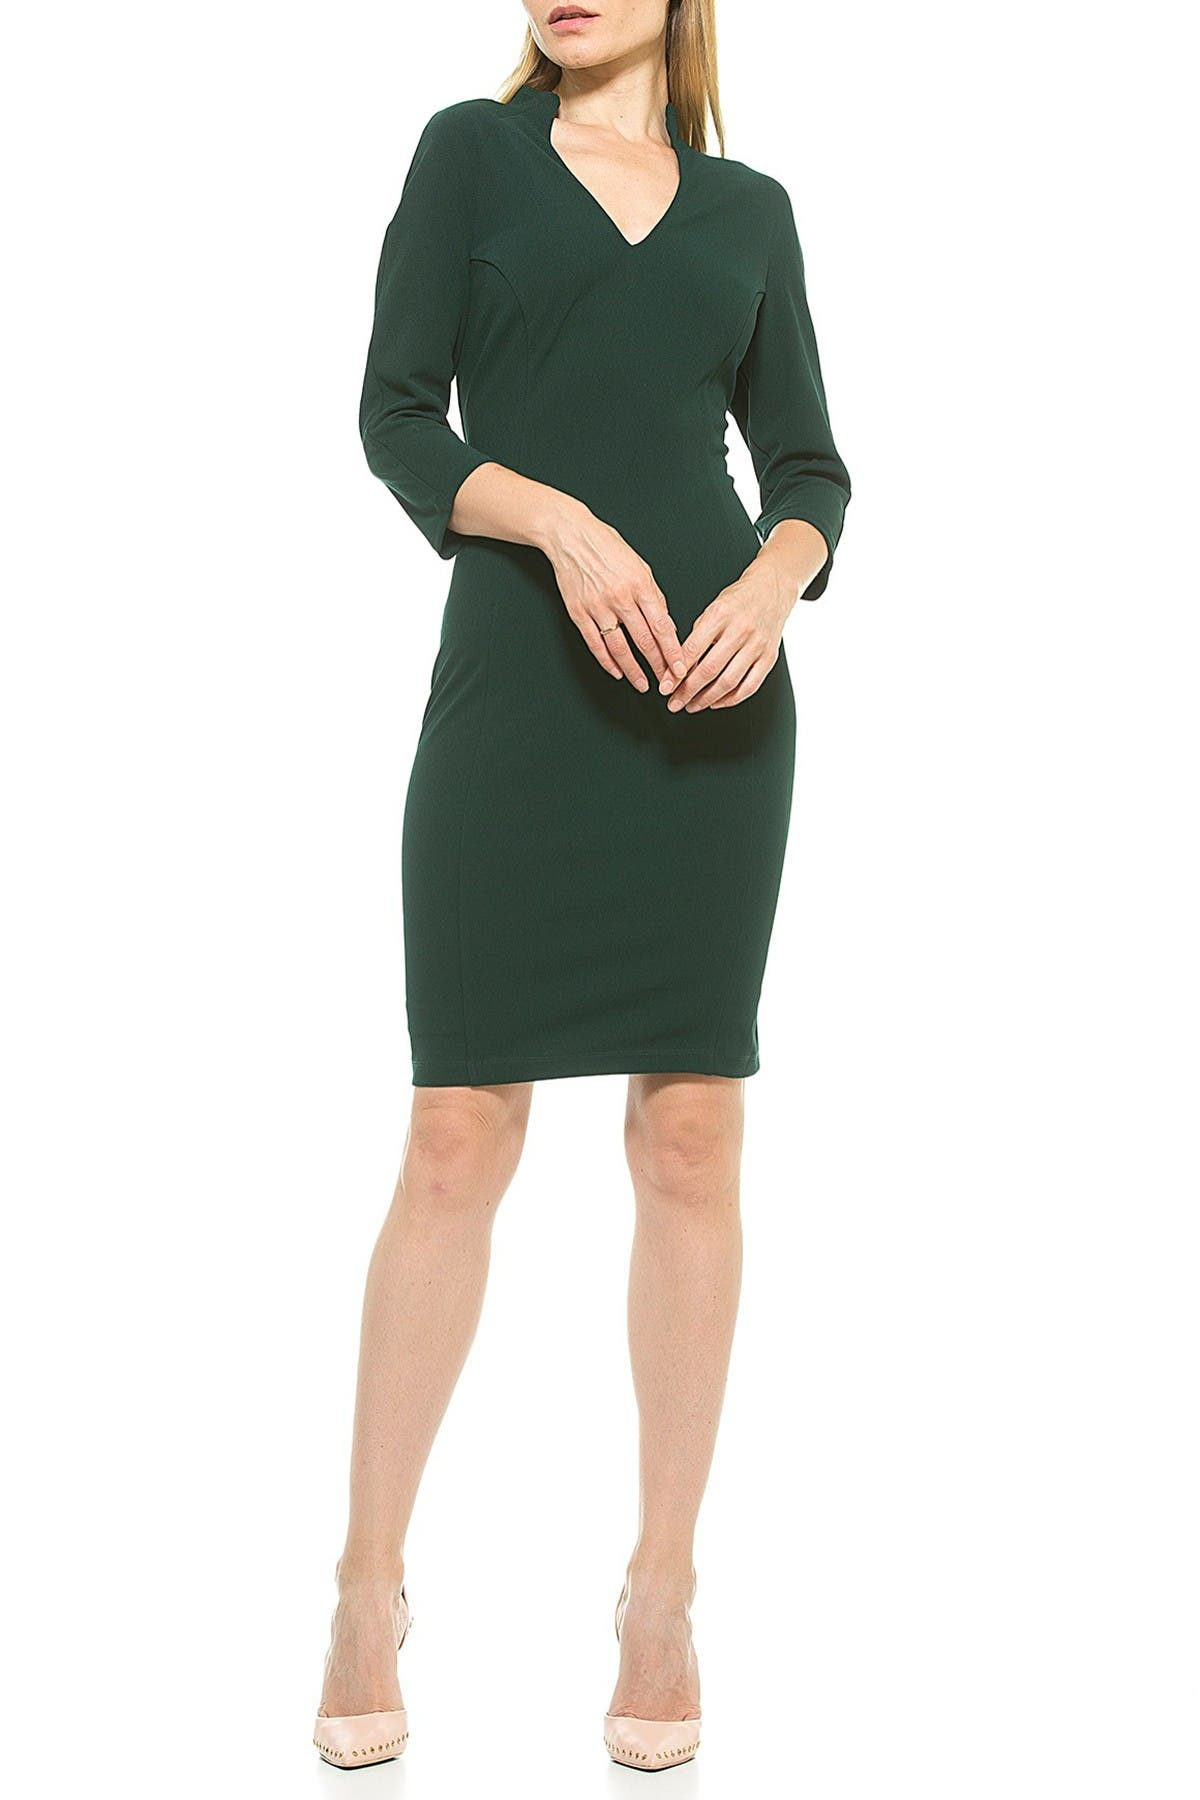 Image of Alexia Admor Aria Fitted V-Neck Sheath Dress